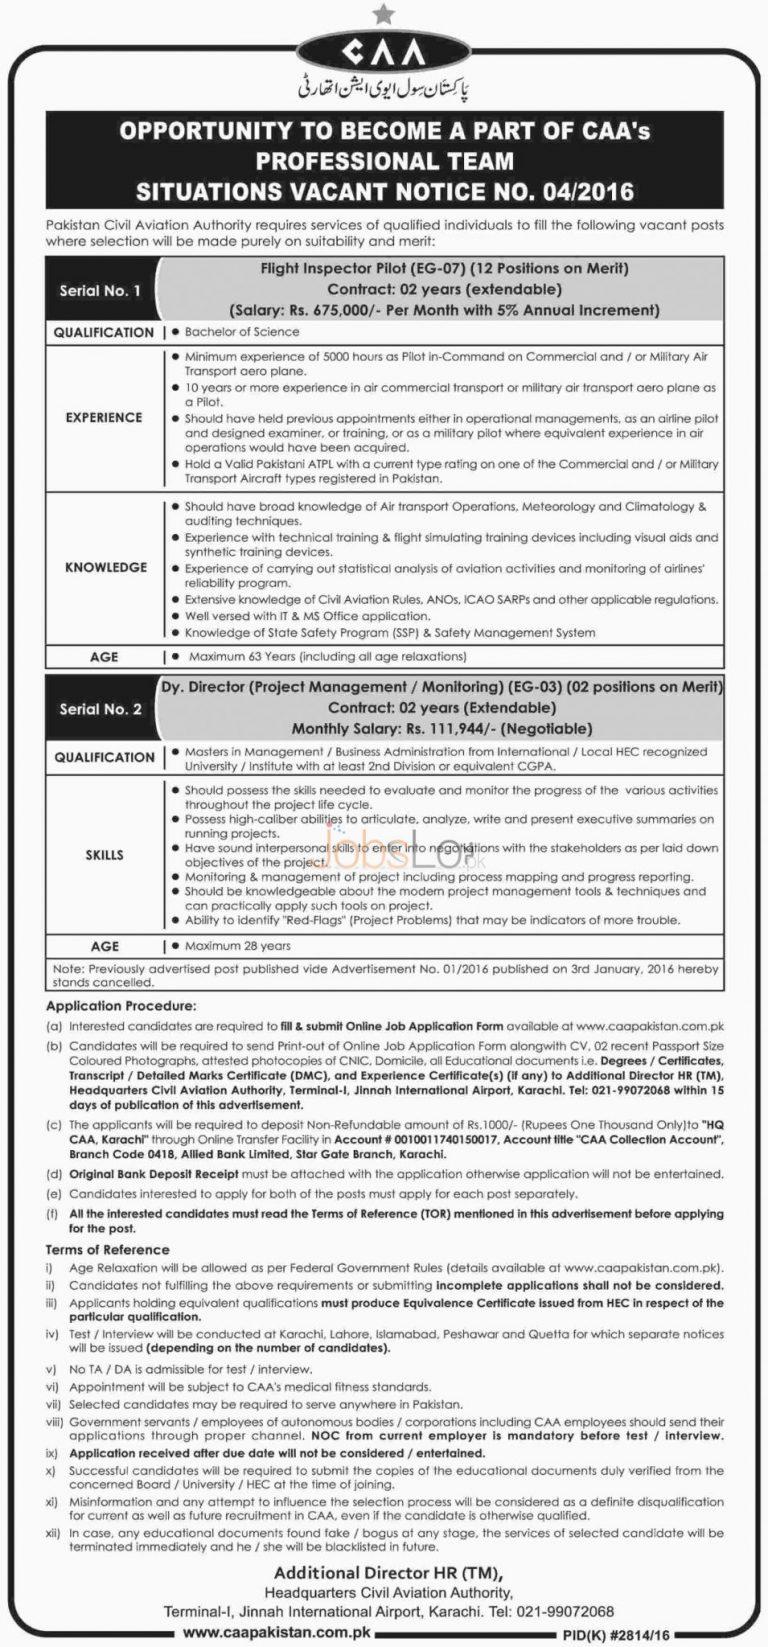 Pakistan Civil Aviation Authority Jobs February 2016 Karachi Application Forms Last Date